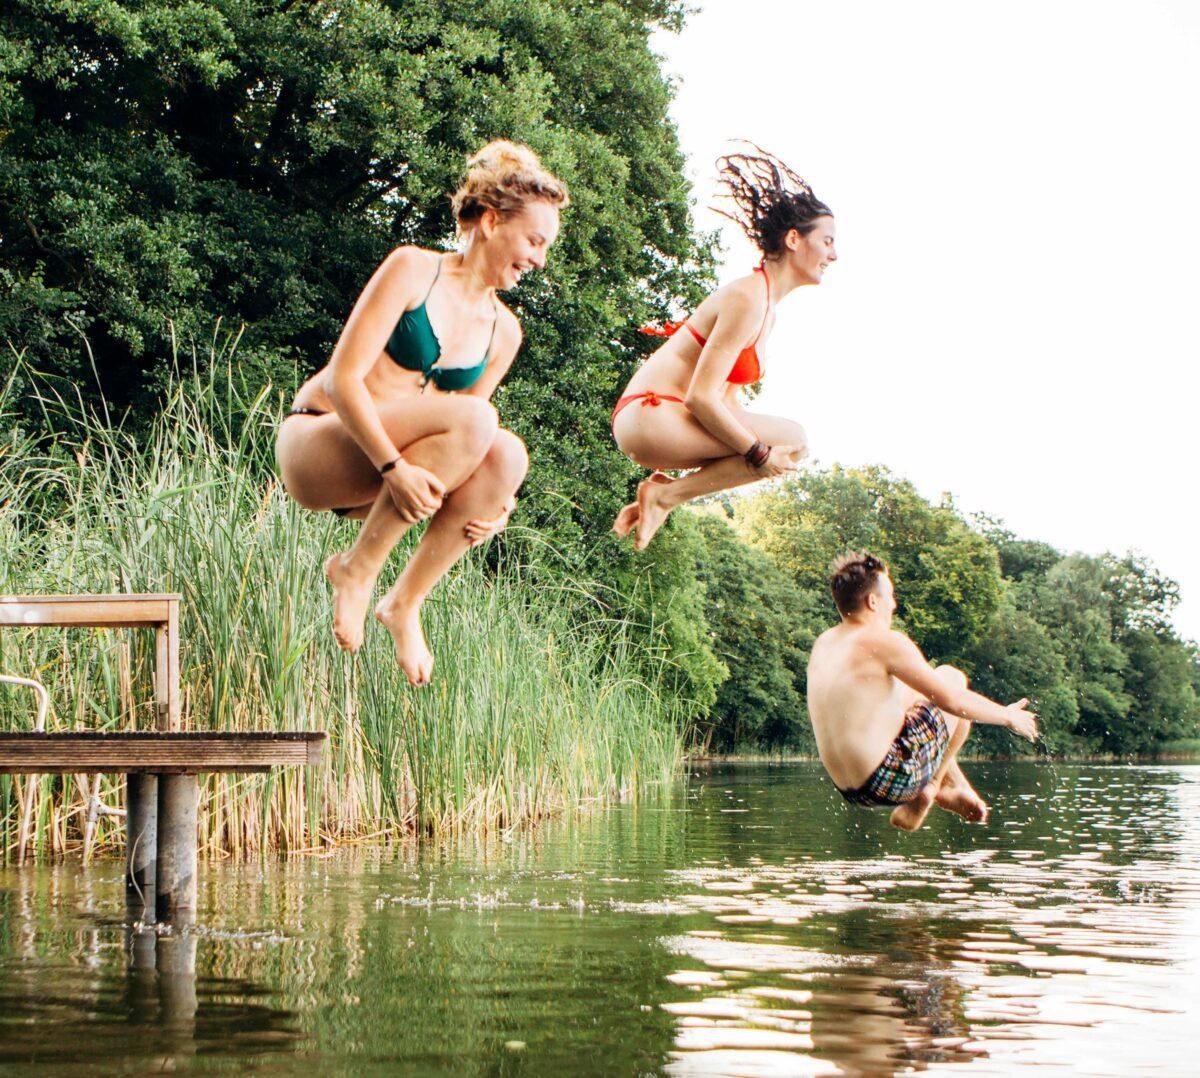 Friese campagne voor biodiversiteit van start